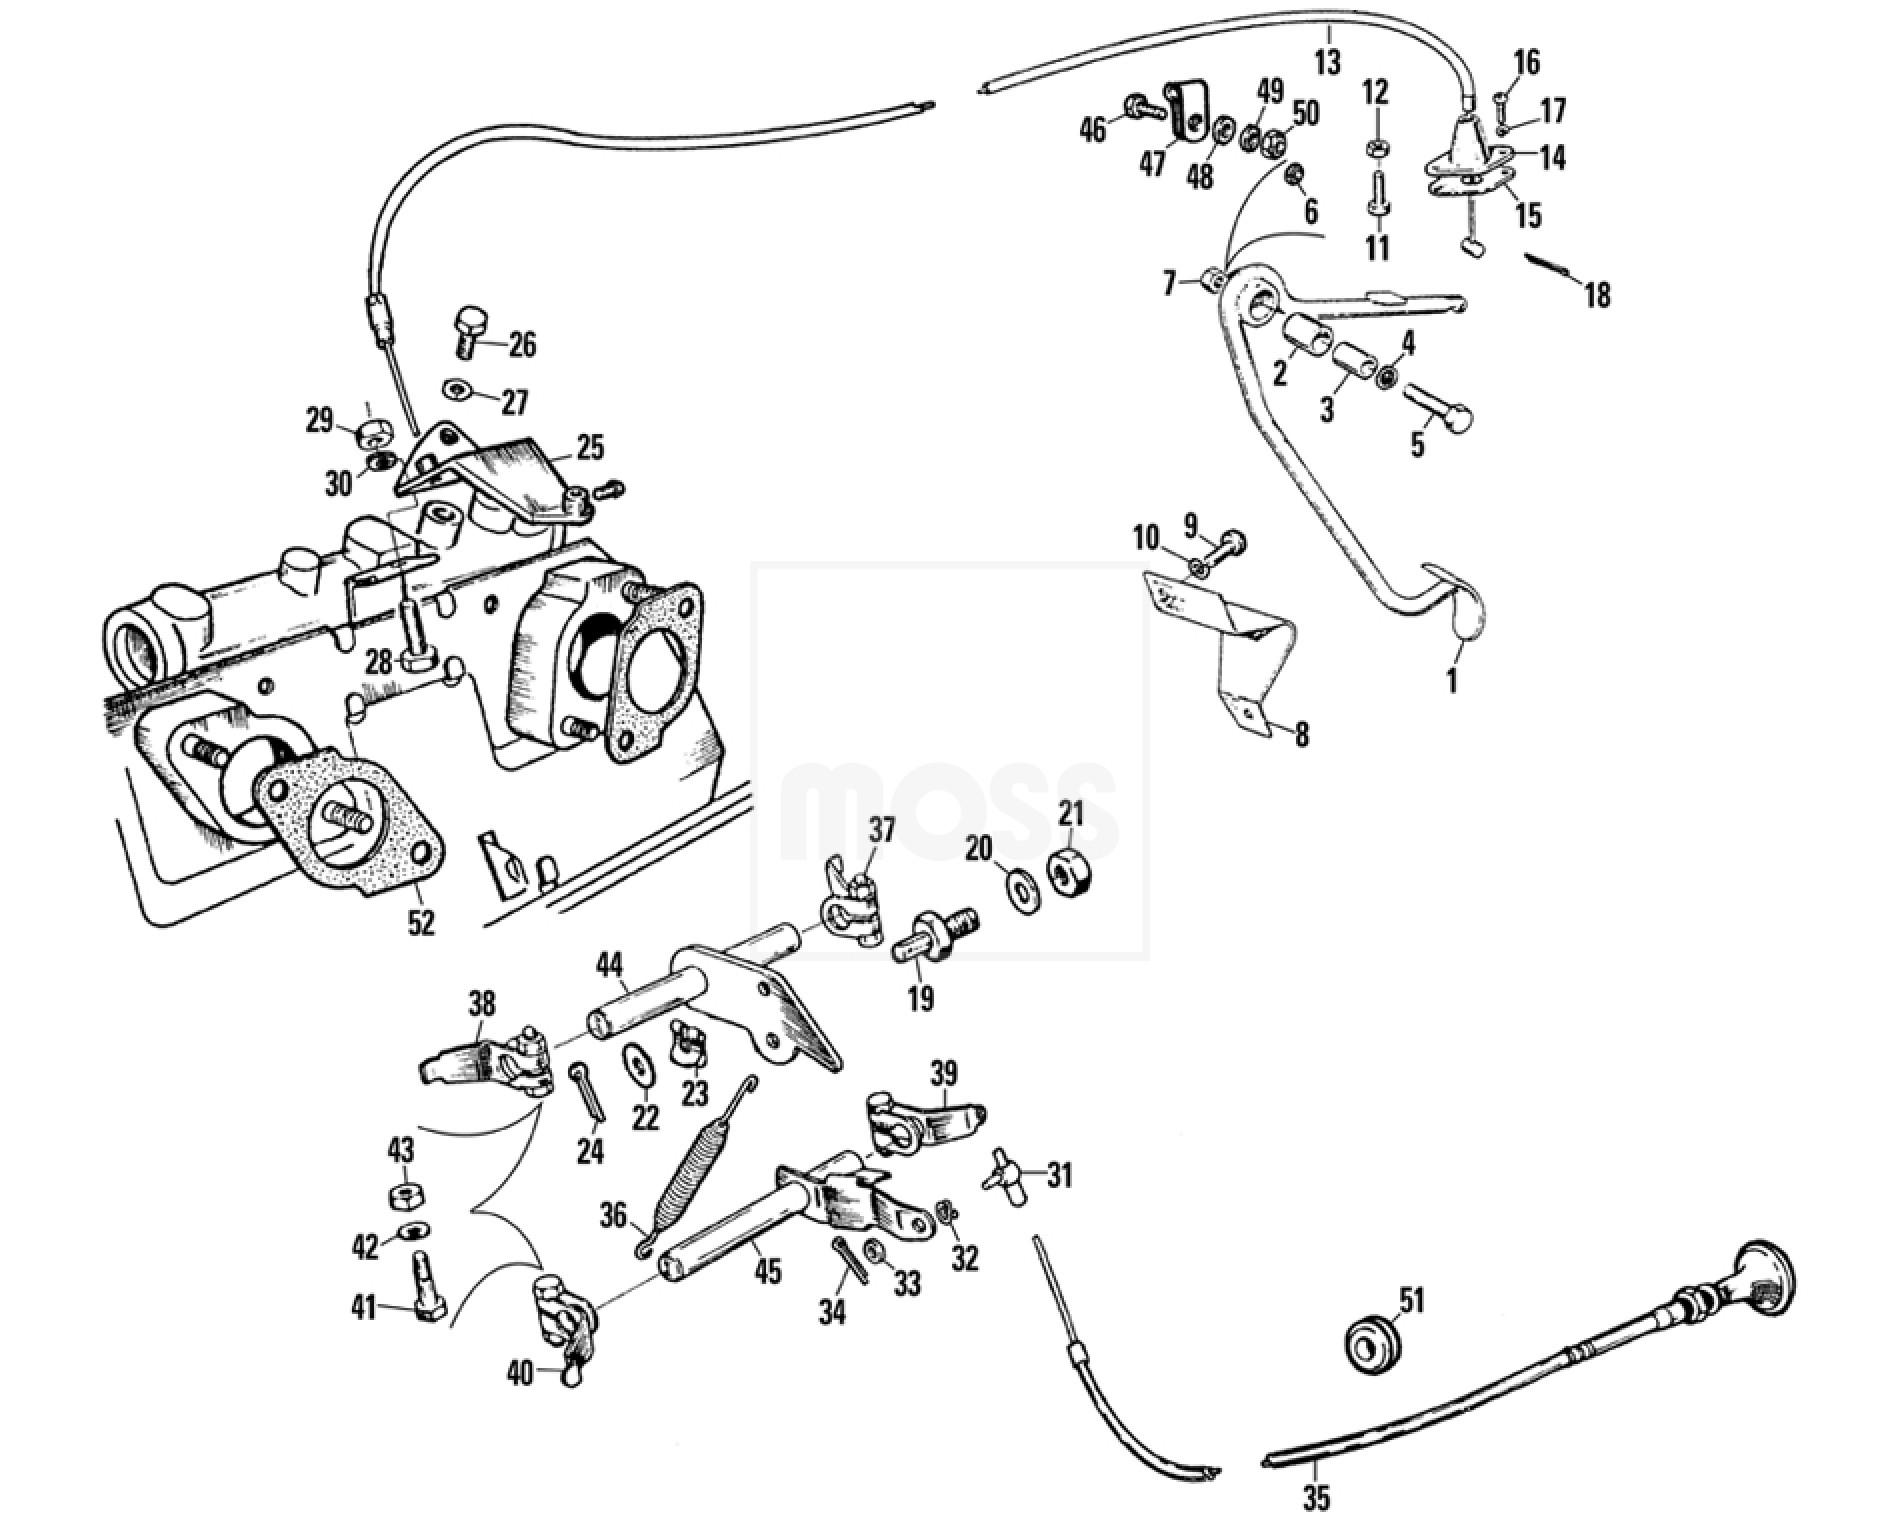 Engine Controls Su Hif4 Carburettors